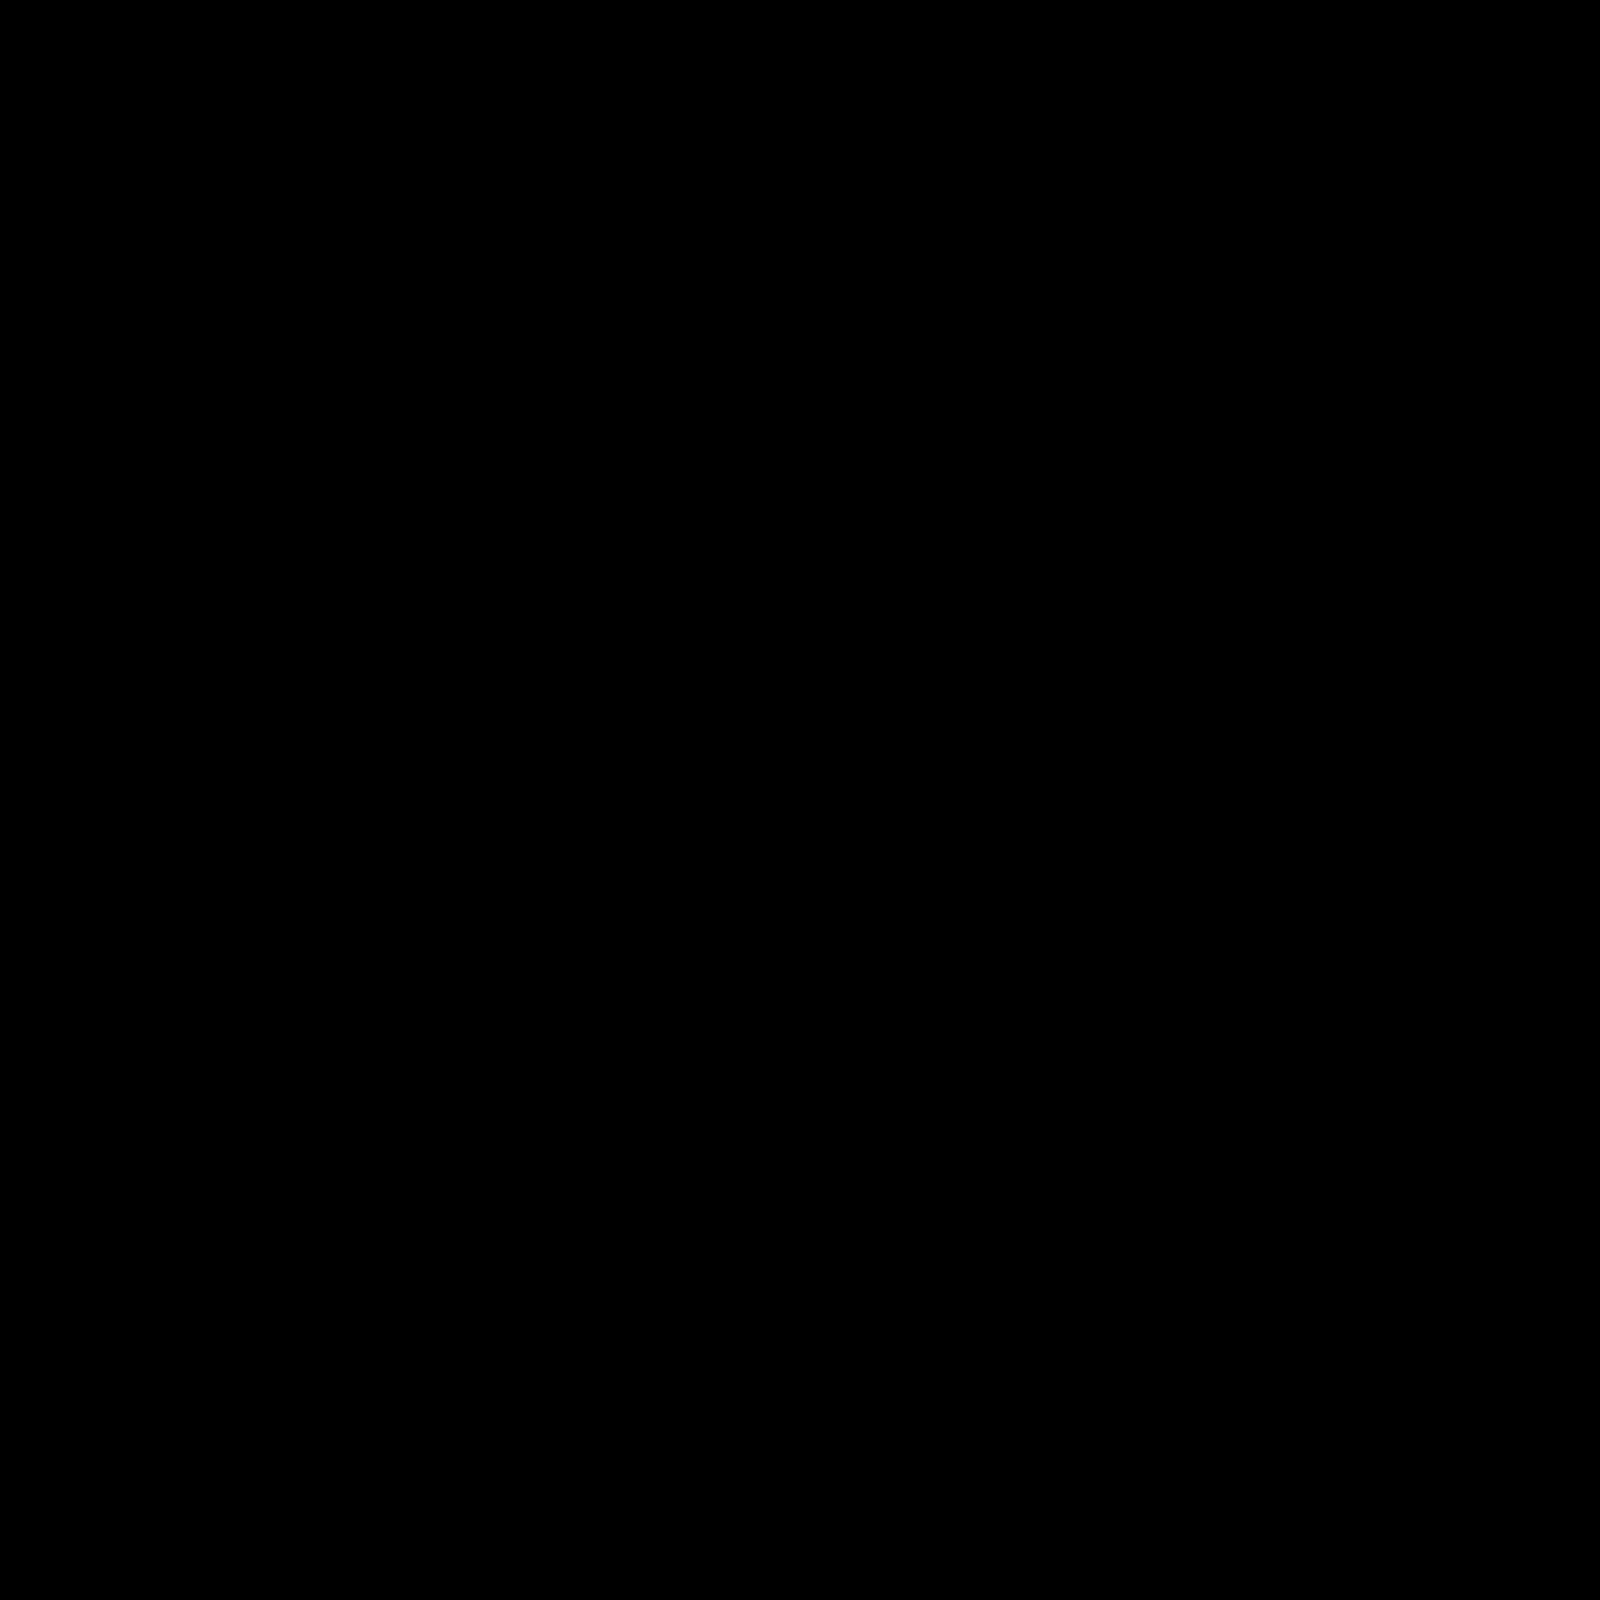 1600x1600 Slender Man Icon